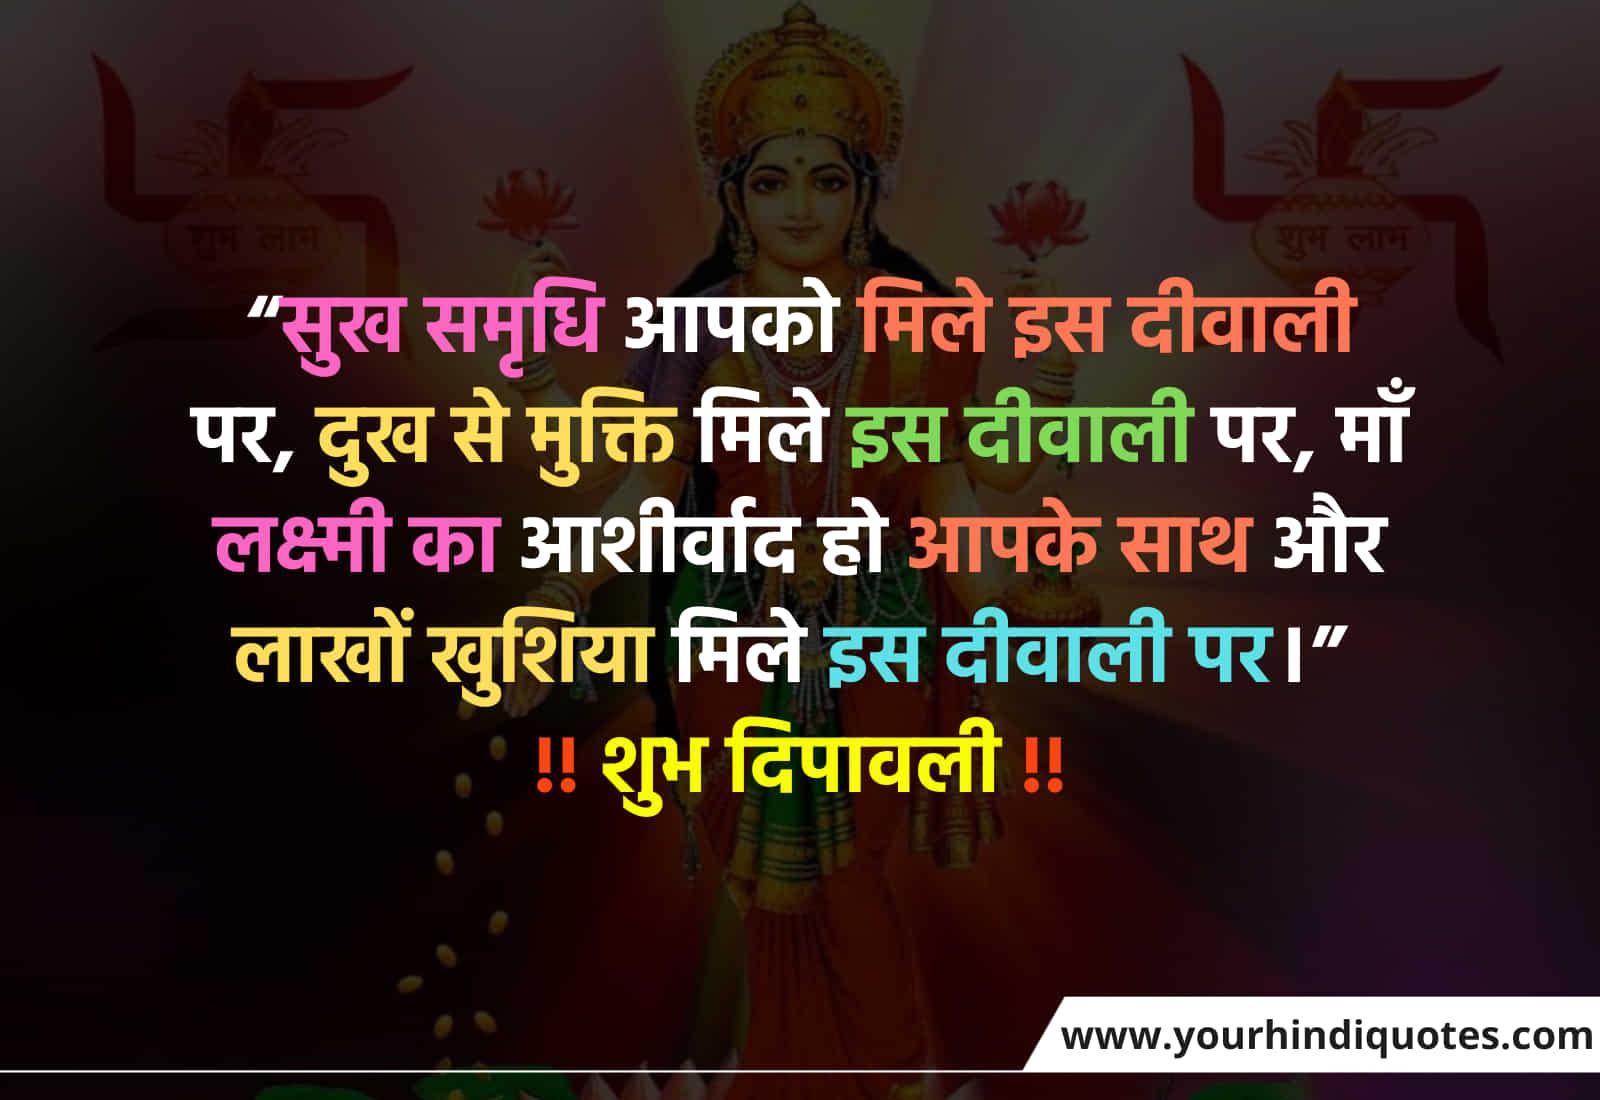 Inspiring Happy Diwali Wishes